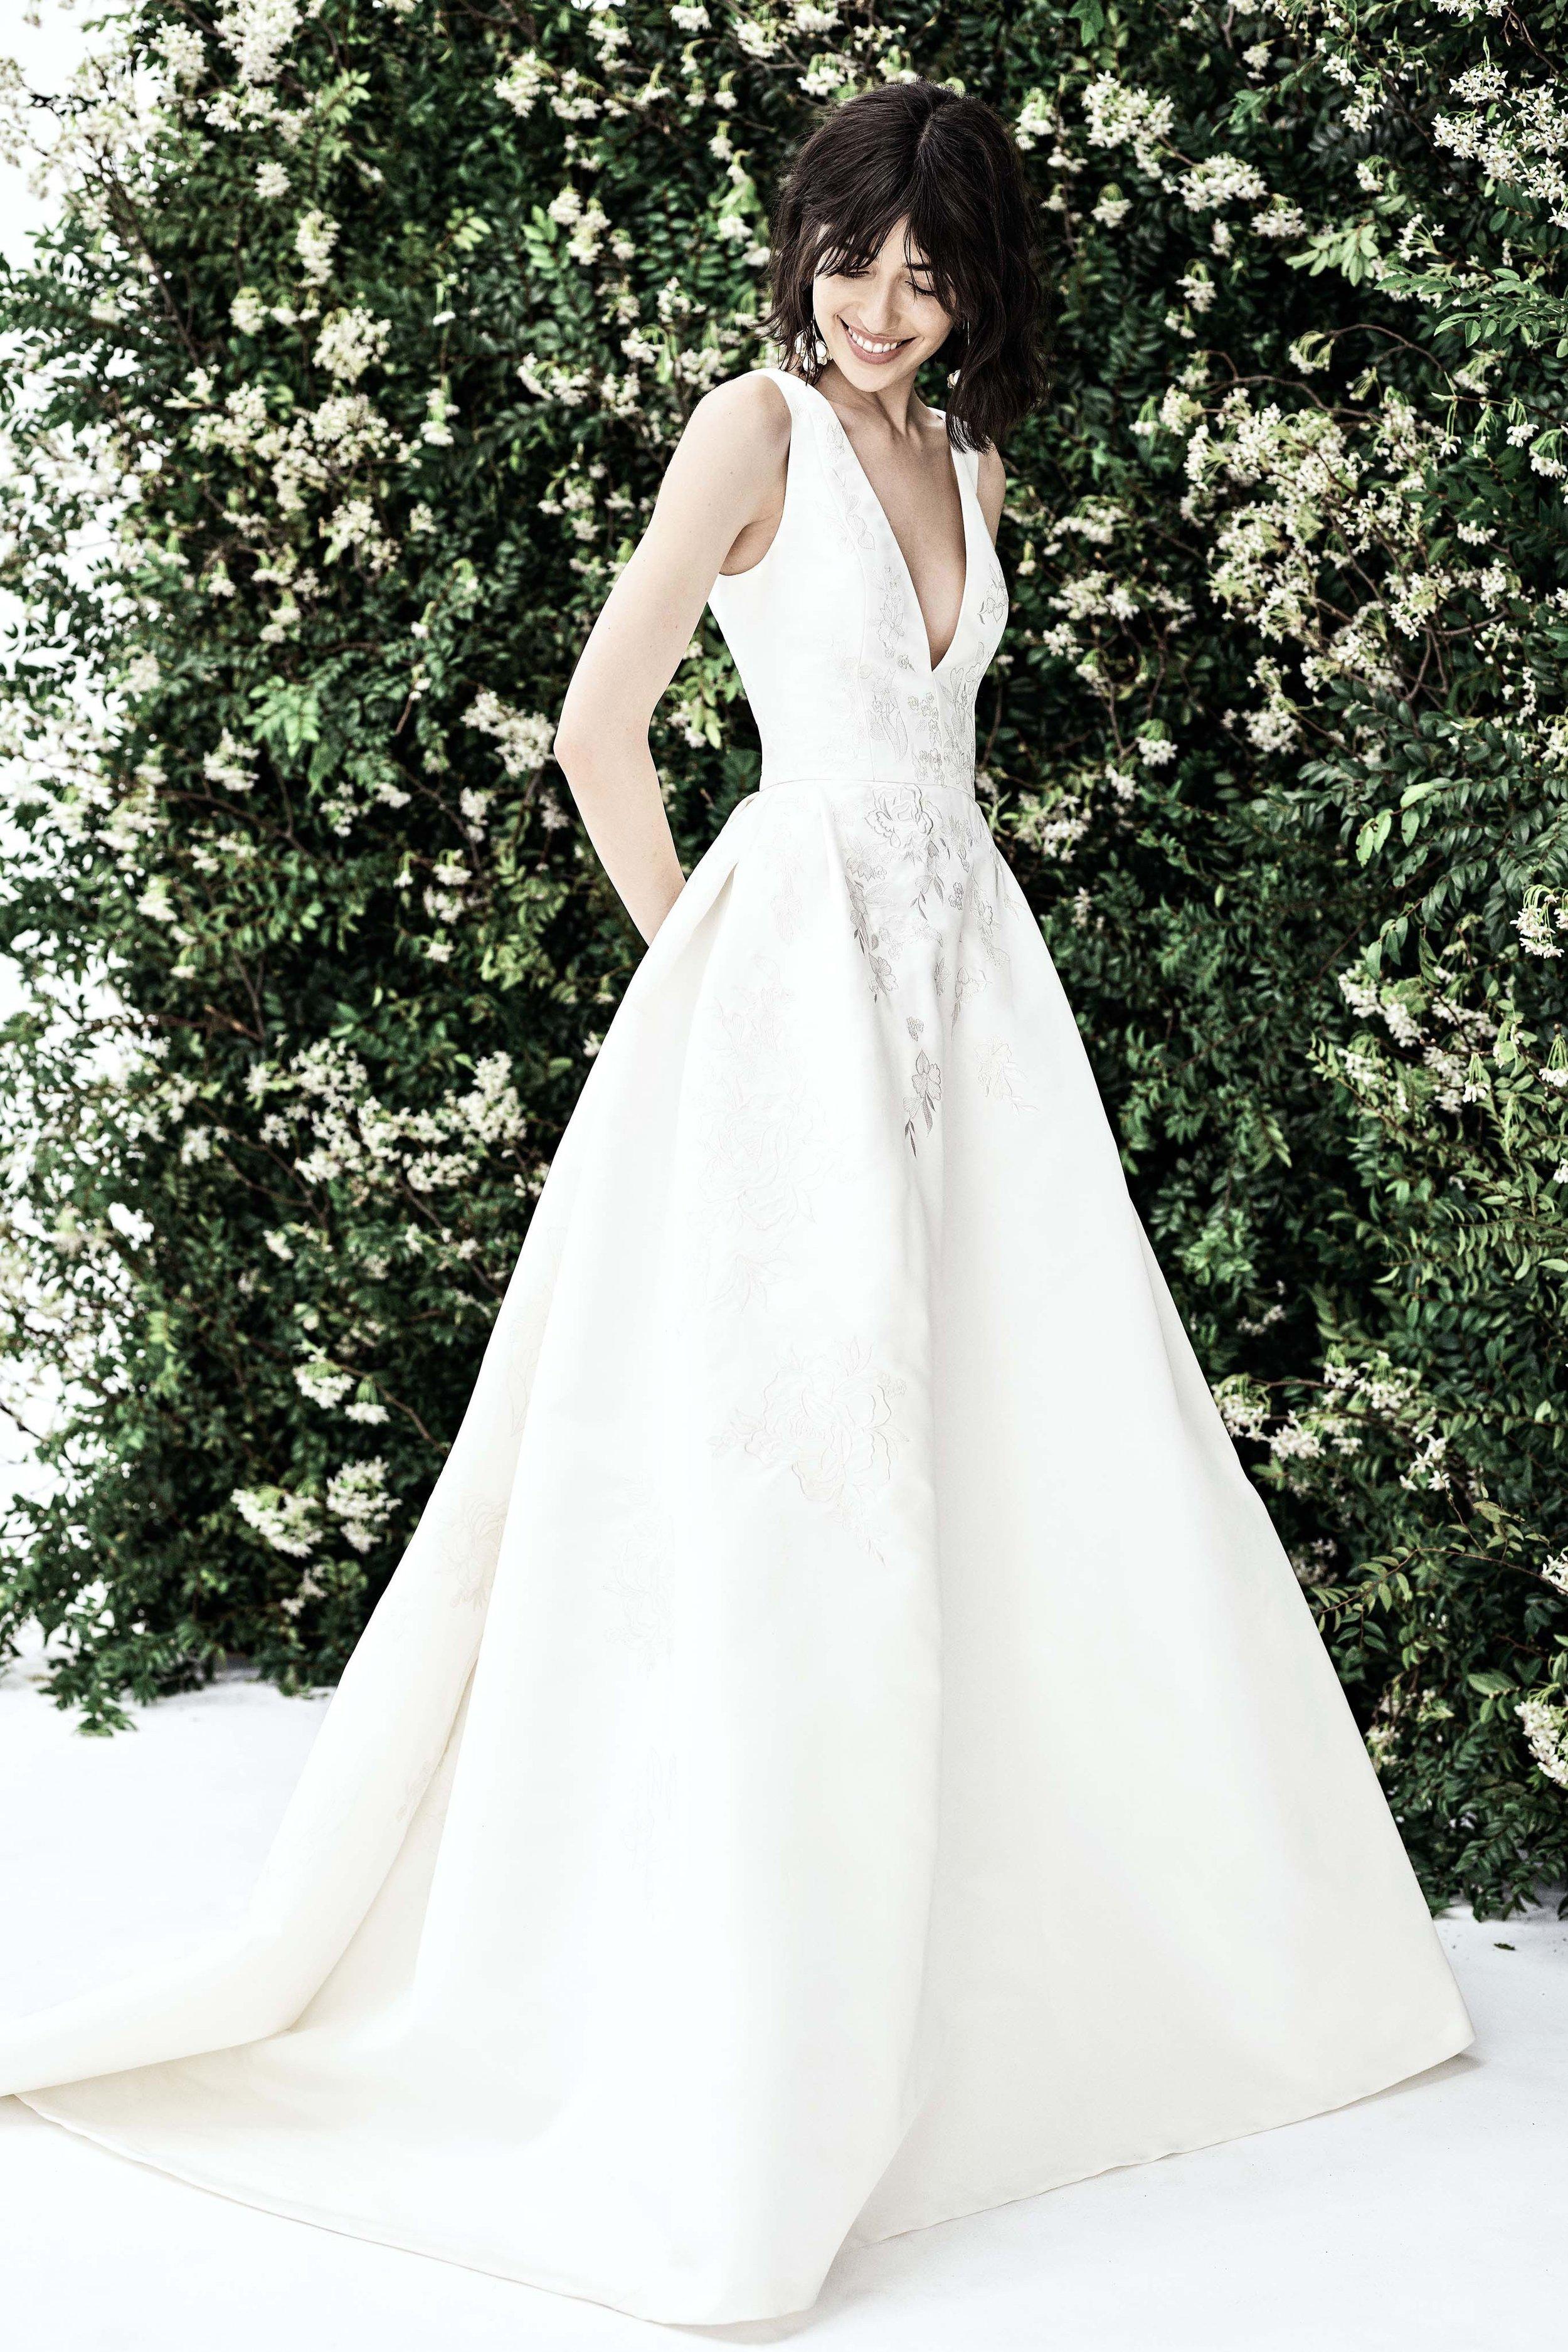 00005-Carolina-Herrera-New-York-Bridal-Spring-2020-credit-Courtesy-of-Carolina-Herrera.jpg